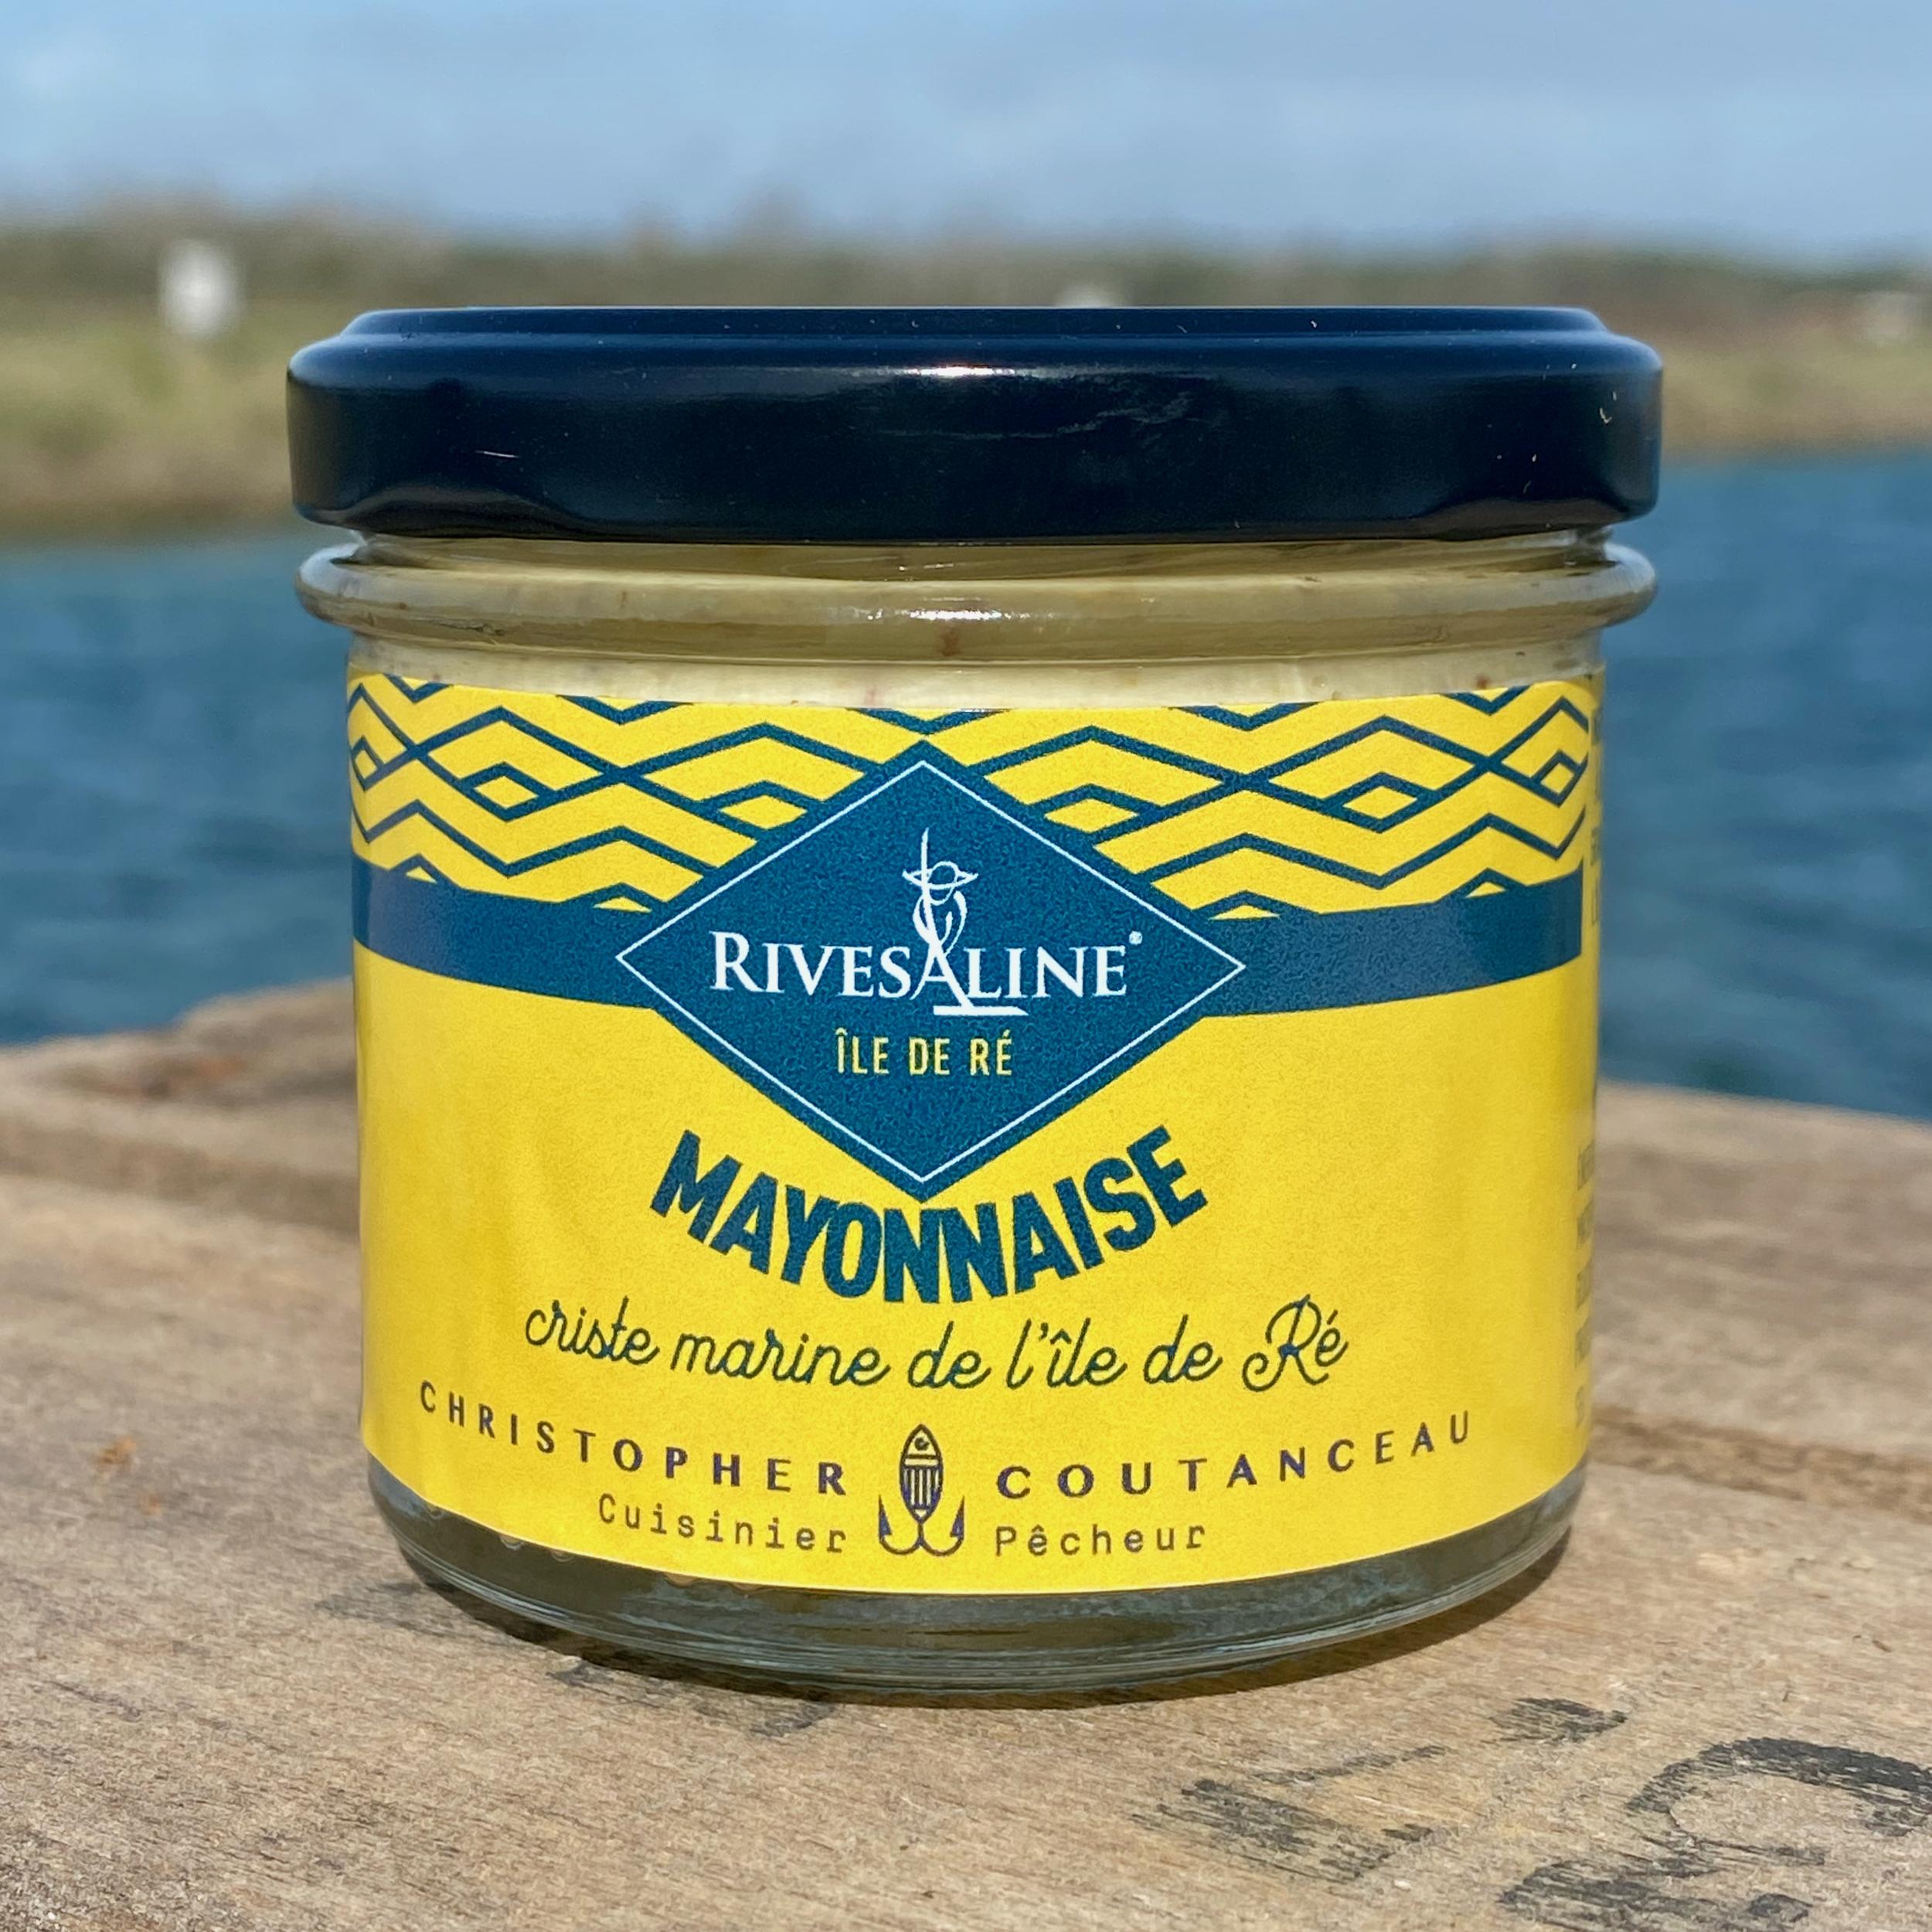 Mayonnaise criste marine 100 g - RIVESALINE